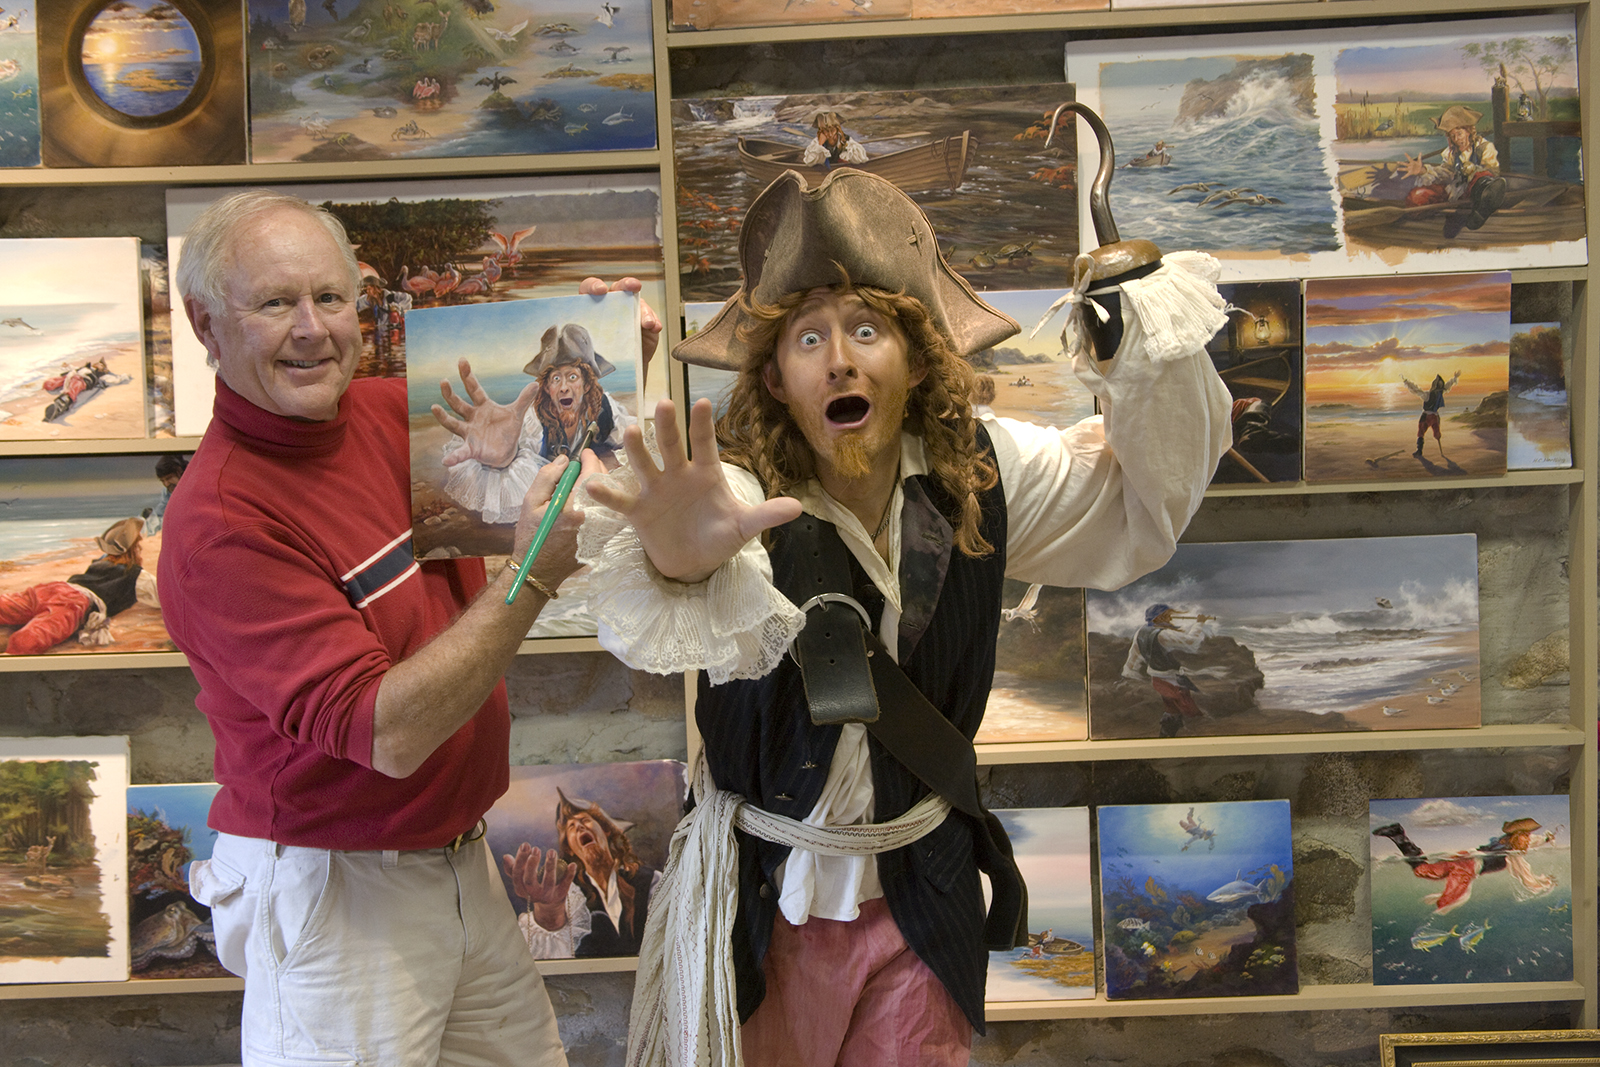 Heiner Hertling and Robert Sams as a Pirate